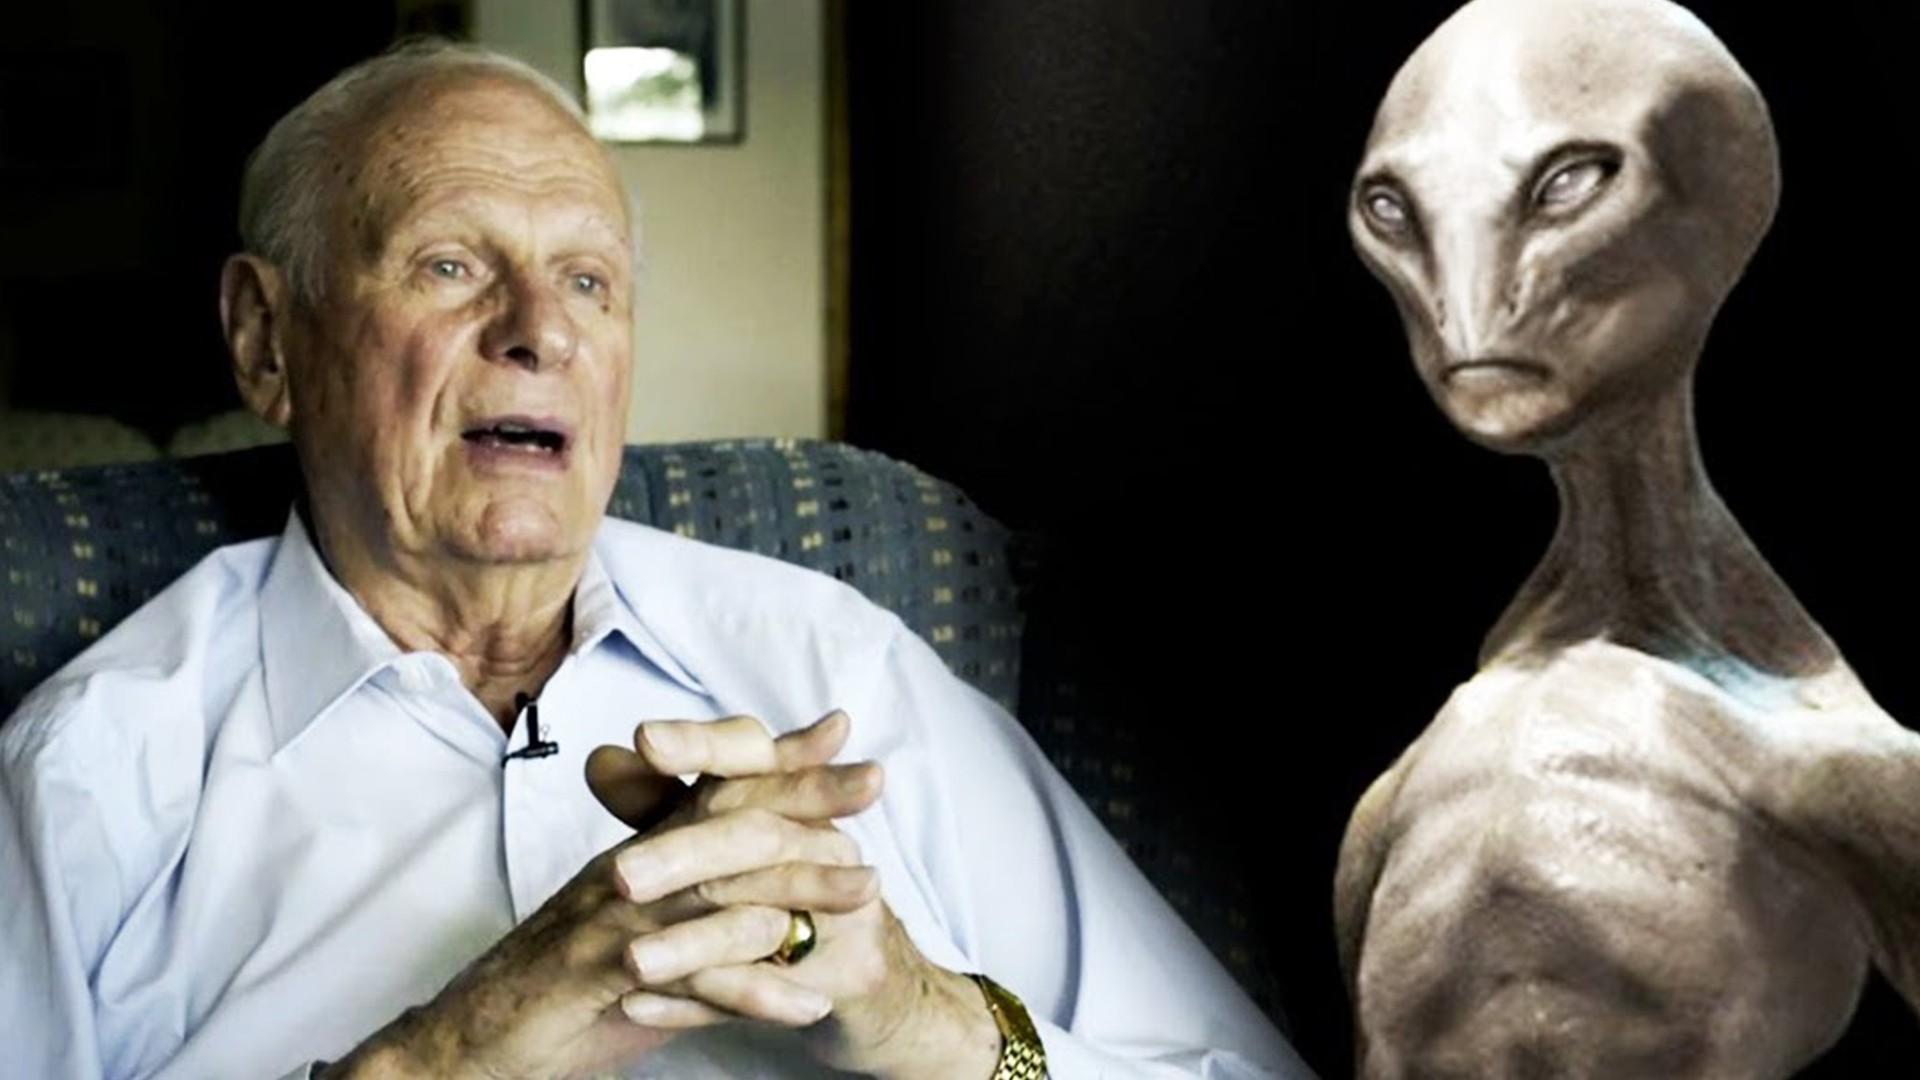 Paul Hellyer, l'ancien ministre qui a vu des aliens